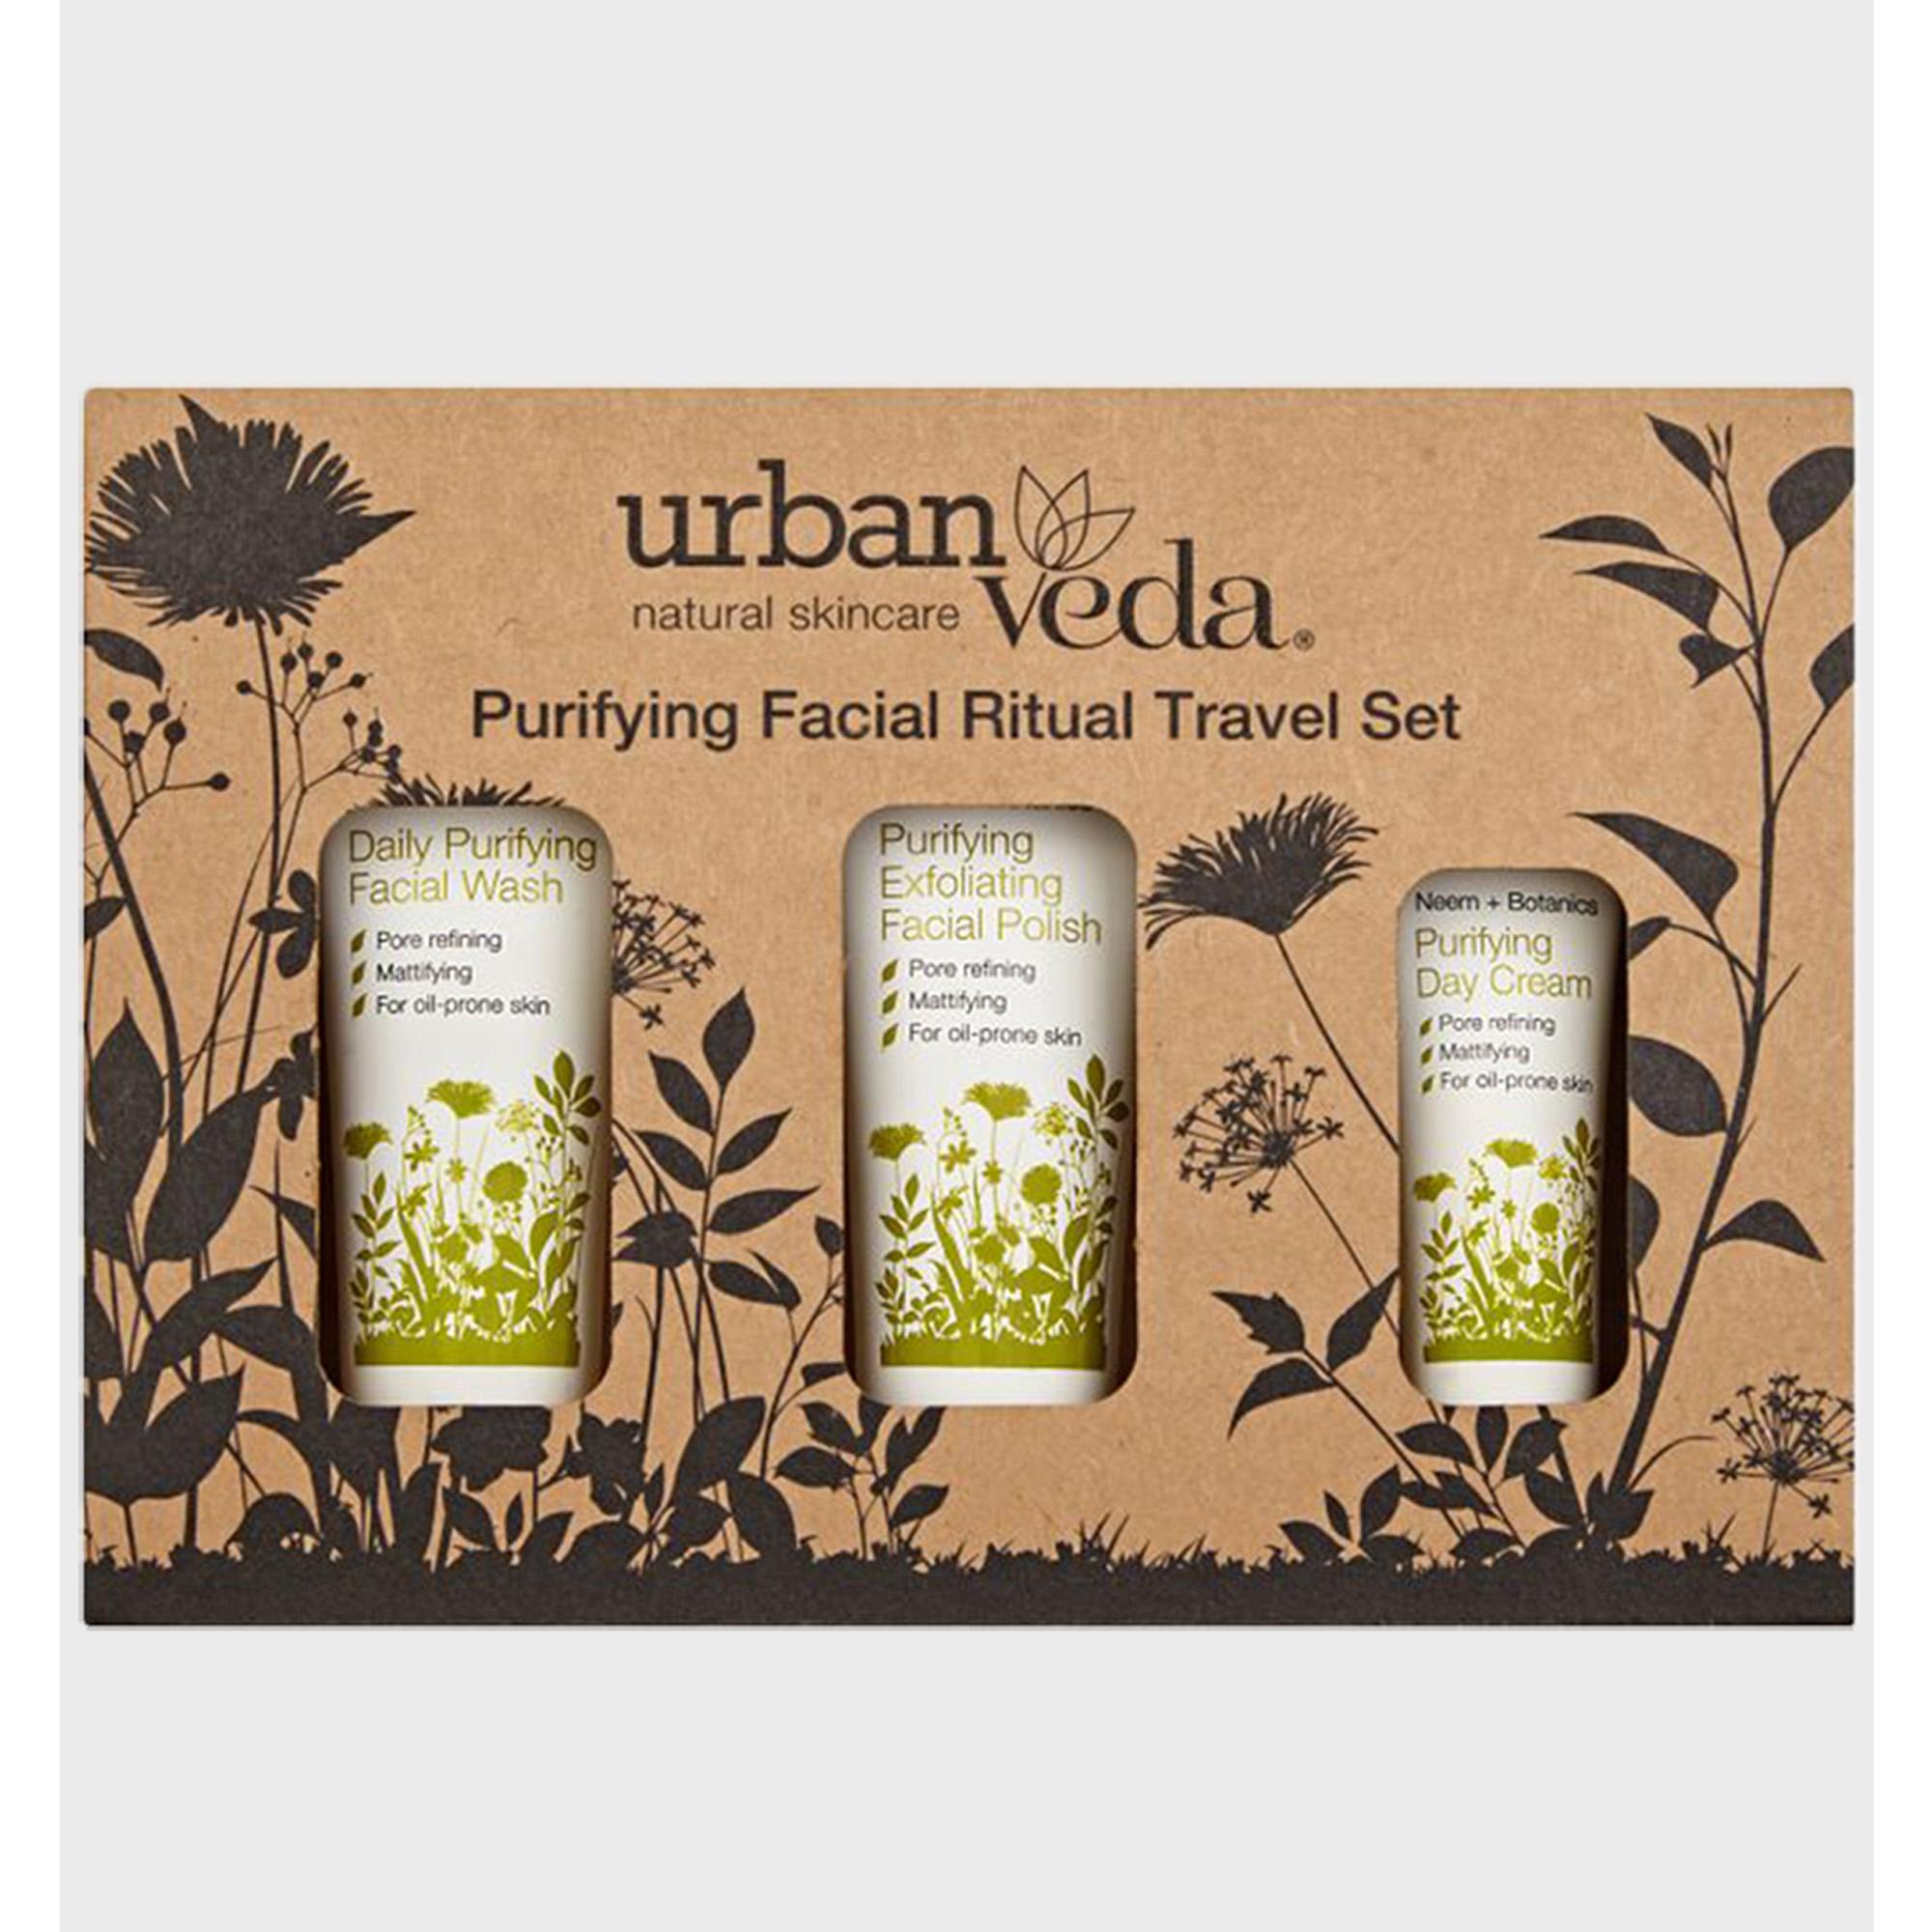 Urban Veda | Urban Veda Purifying Facial Ritual Travel Sets